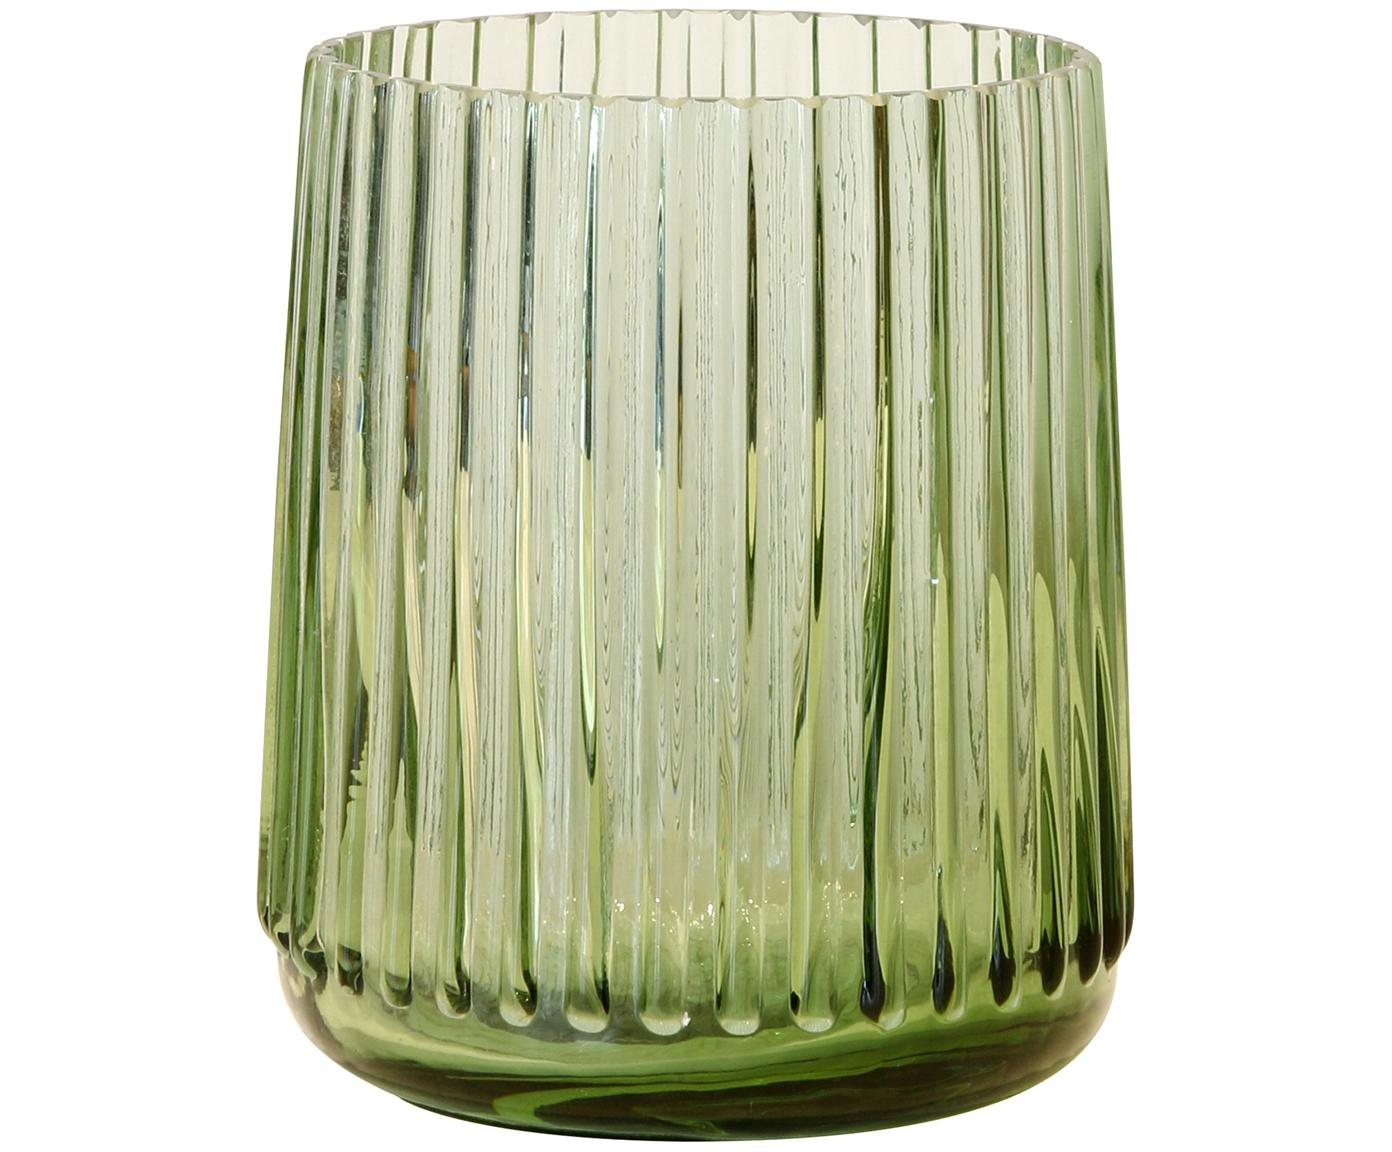 XS glazen vaas Ribbed in groen, Glas, Grasgroen, Ø 11 x H 9 cm